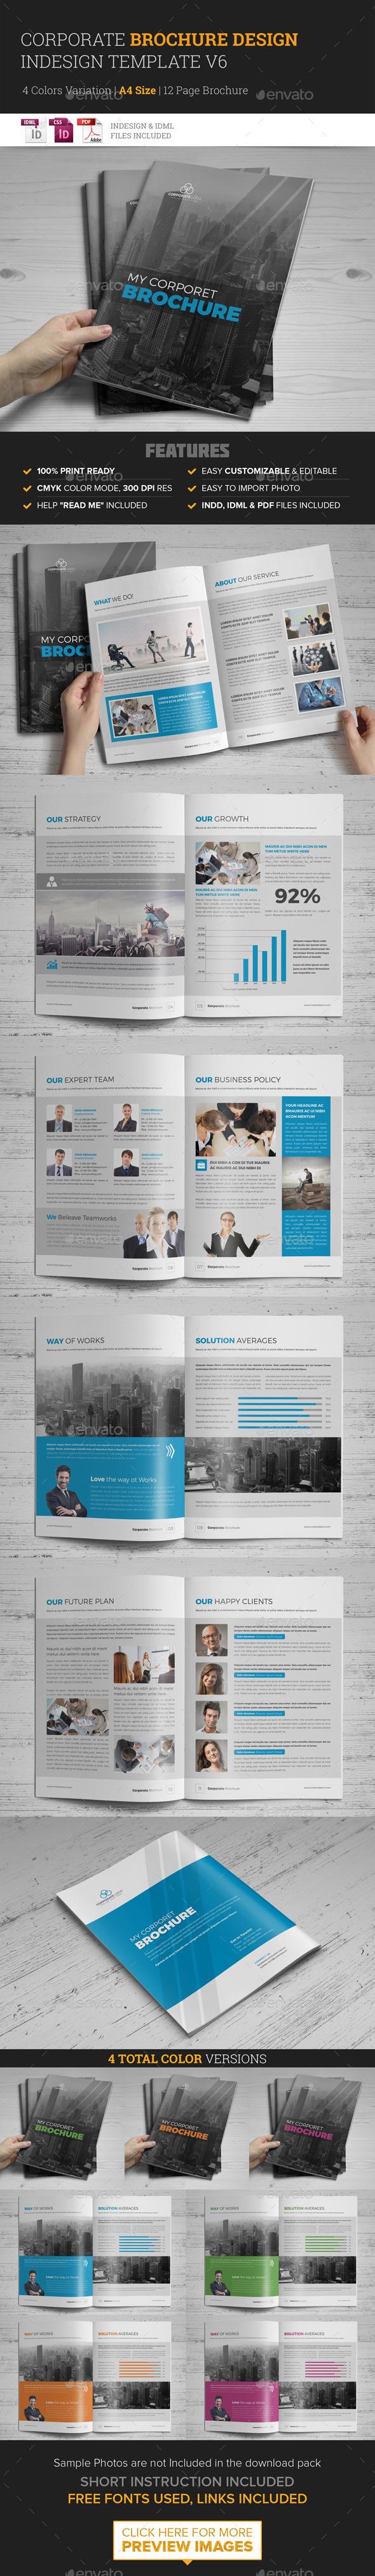 Corporate Multipurpose Brochure Template v6  - Corporate Brochures